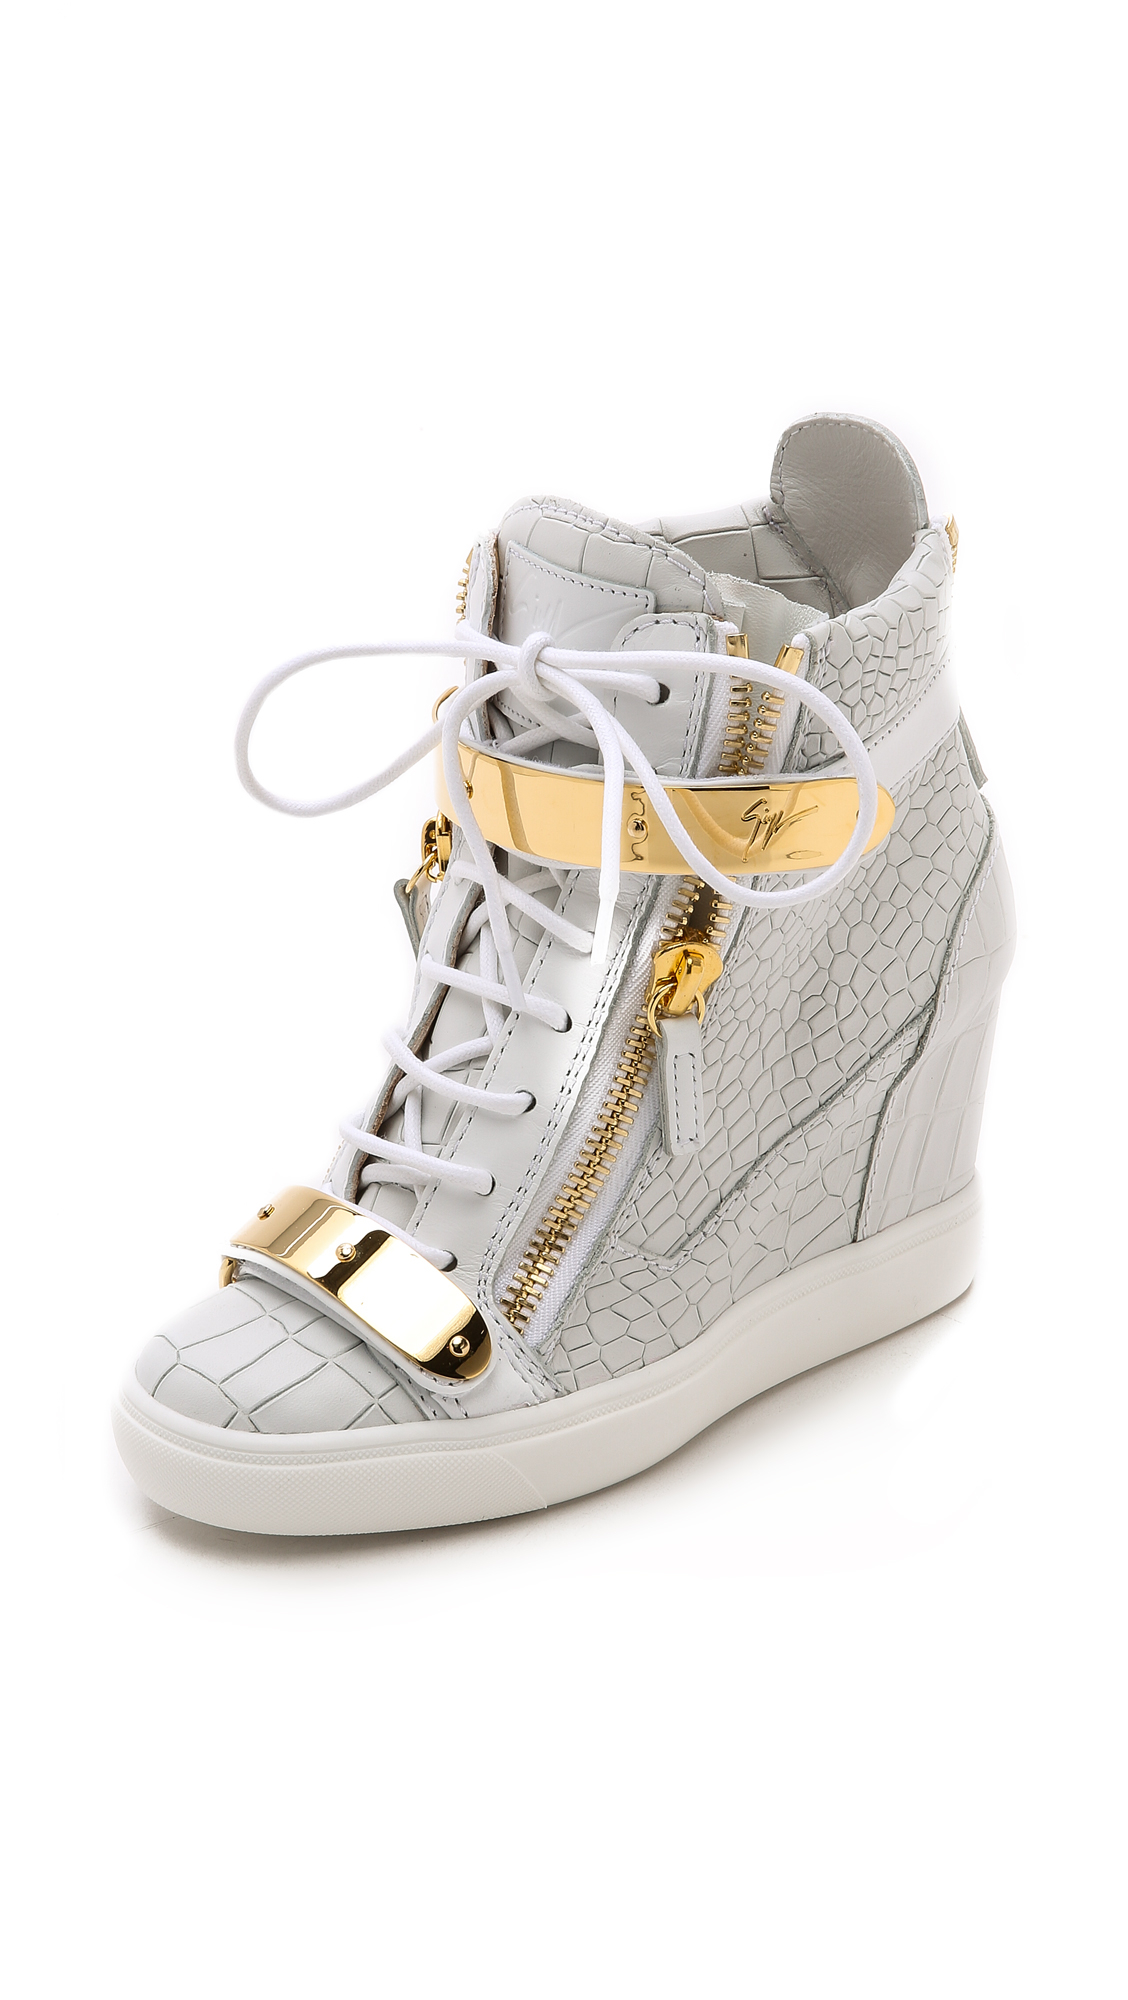 5df58f702add Lyst - Giuseppe Zanotti Croc Embossed Wedge Sneakers - White in White